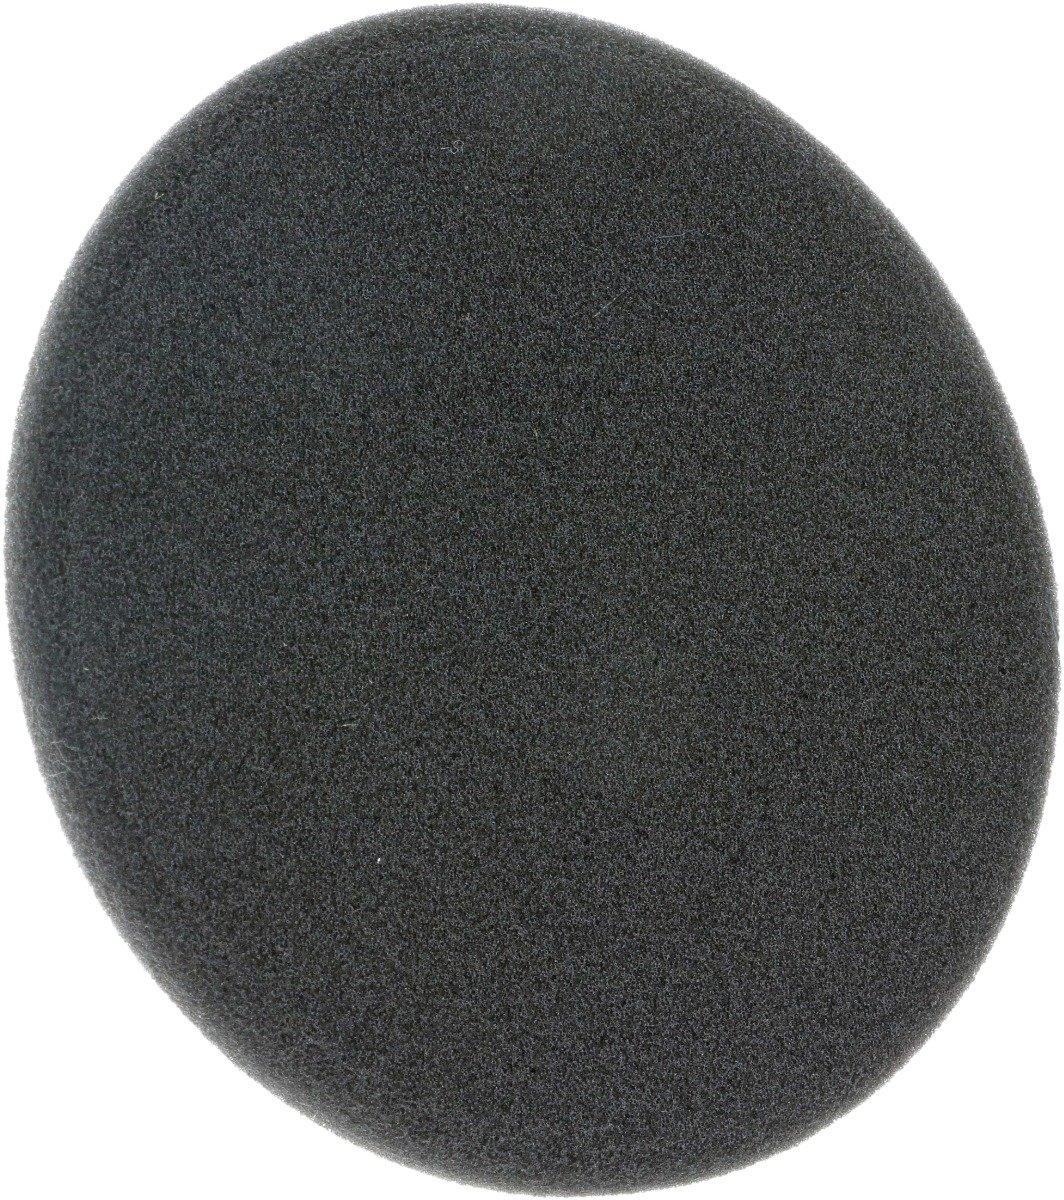 Meguiars Soft Buff DA Foam Finishing pad - d. 15cm kopen